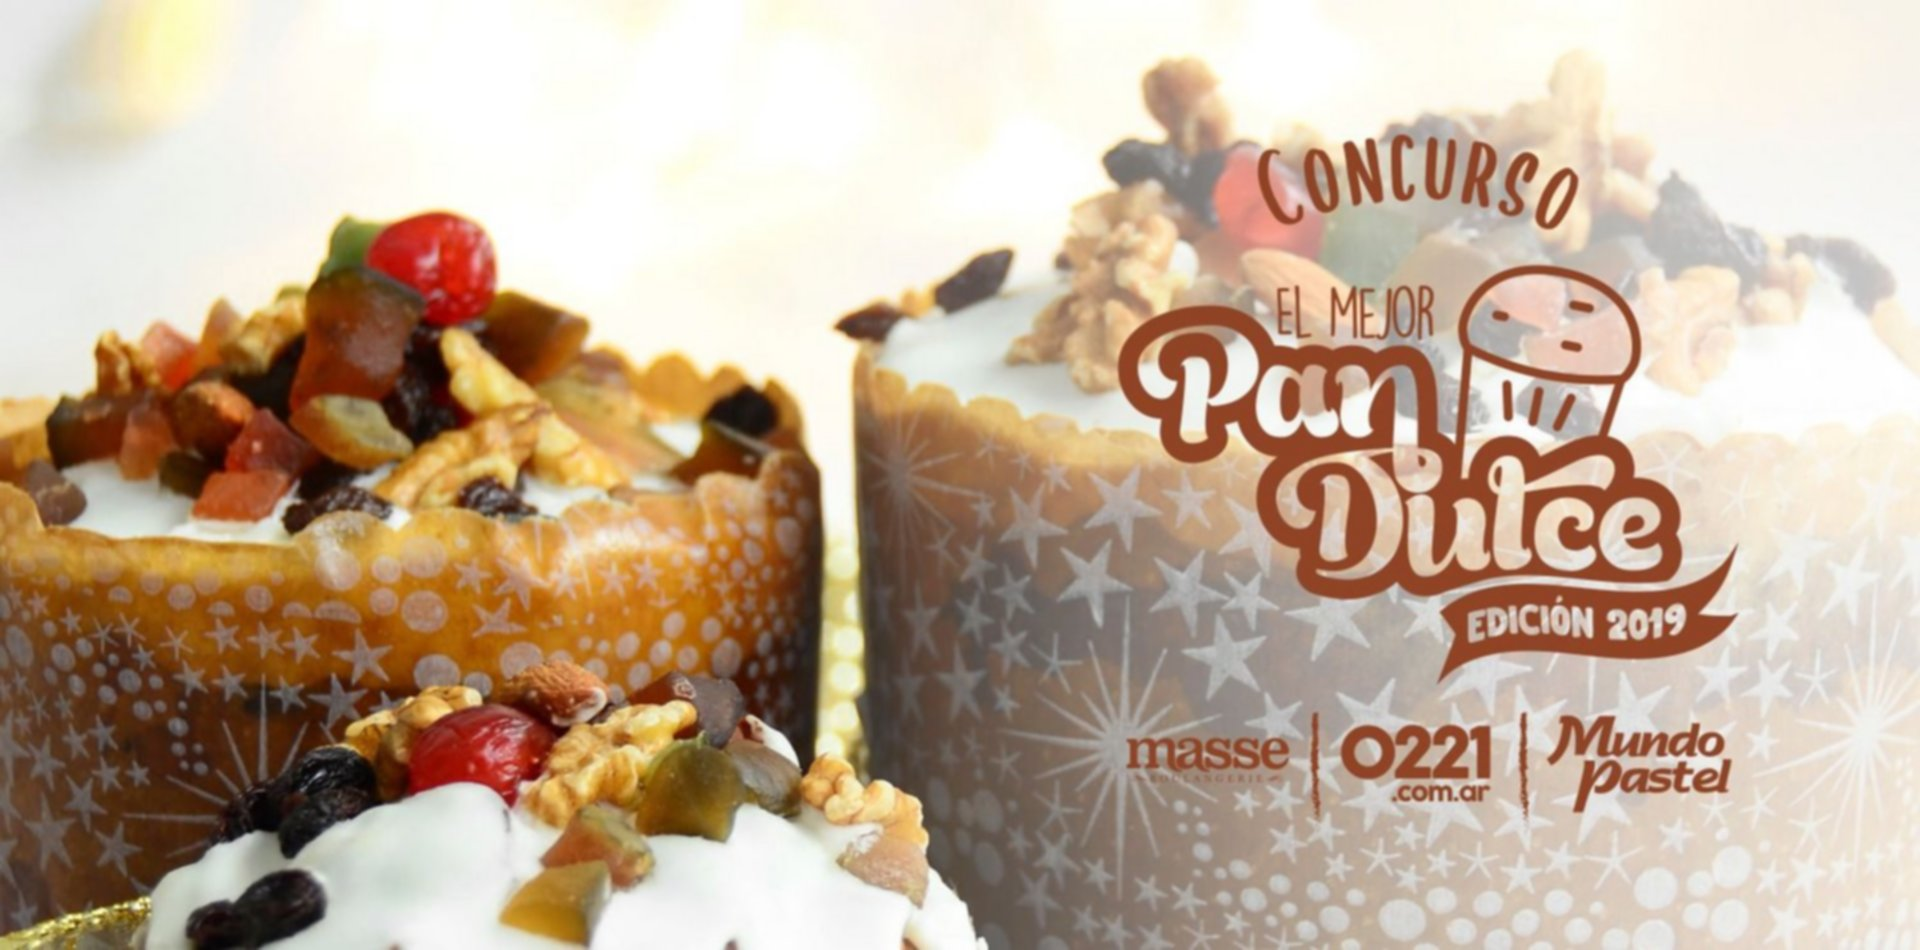 Se lanzó el concurso del Mejor Pan Dulce Artesanal de La Plata 2019